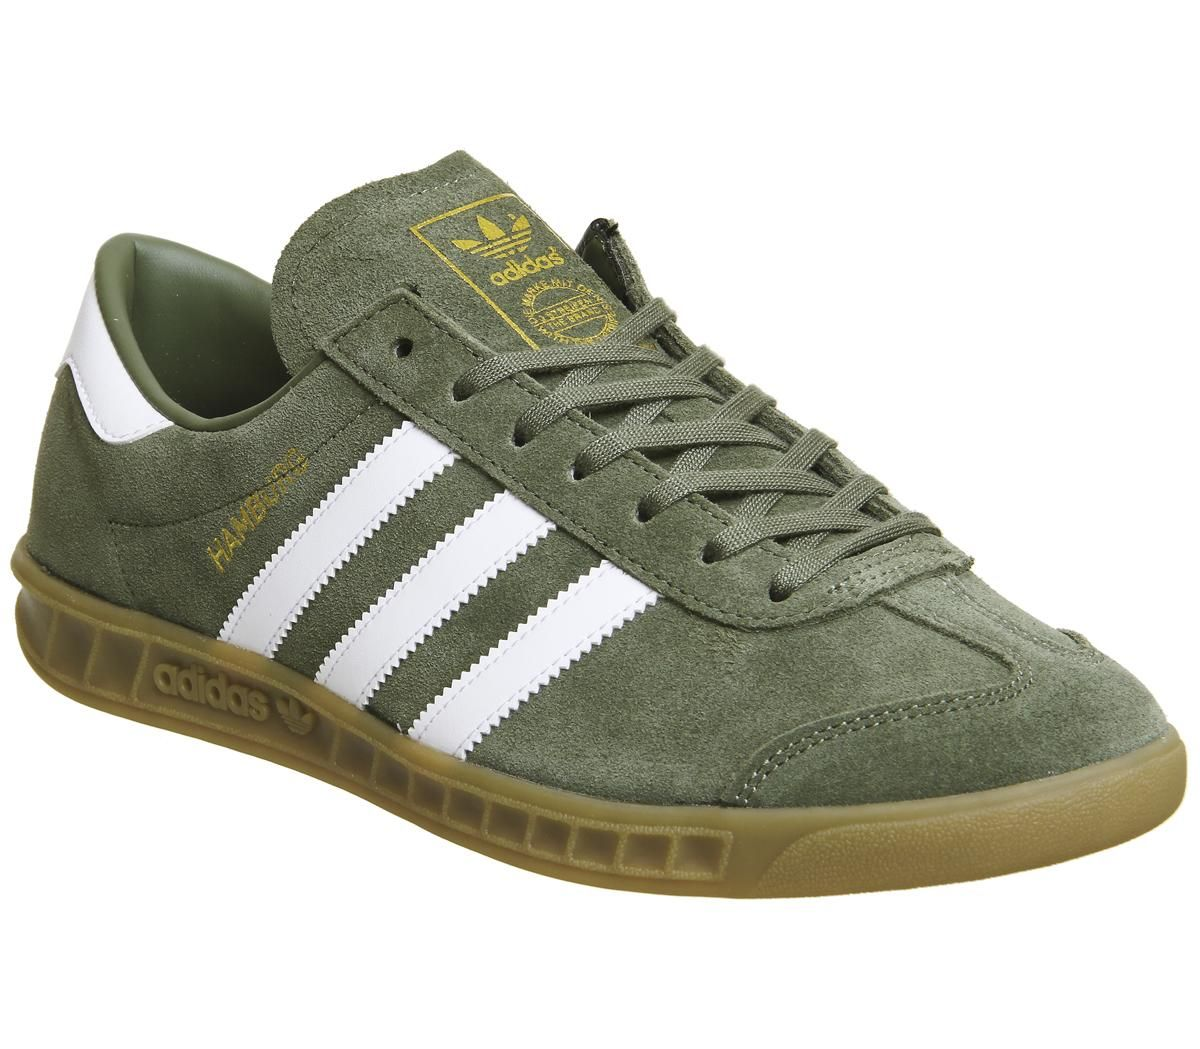 adidas Hamburg Khaki White Exclusive - His trainers | Adidas shoes ...